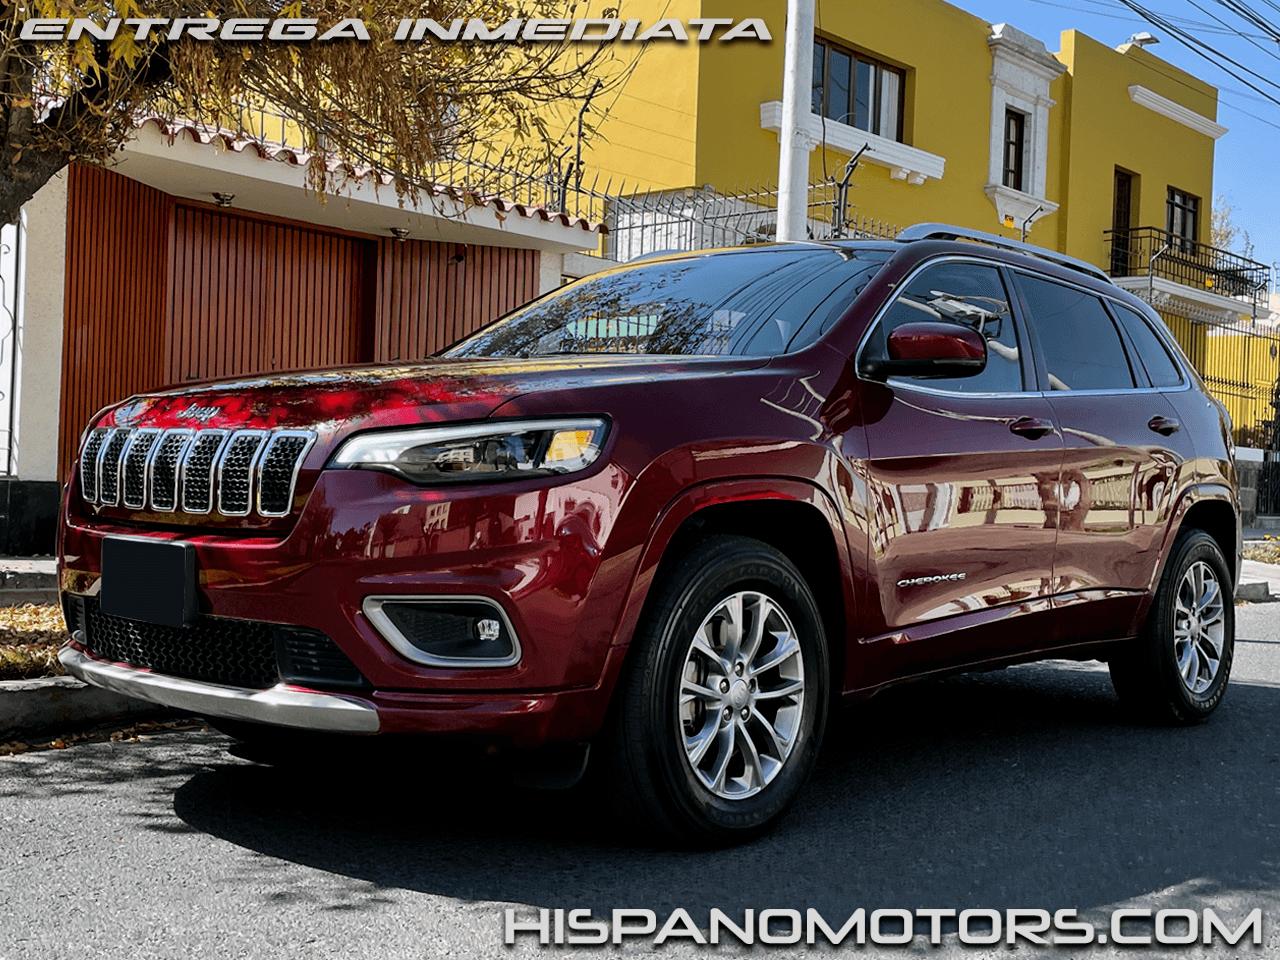 2019 JEEP CHEROKEE 4x4 LATITUDE PLUS - Arequipa - Perú - auto importado por Hispanomotors